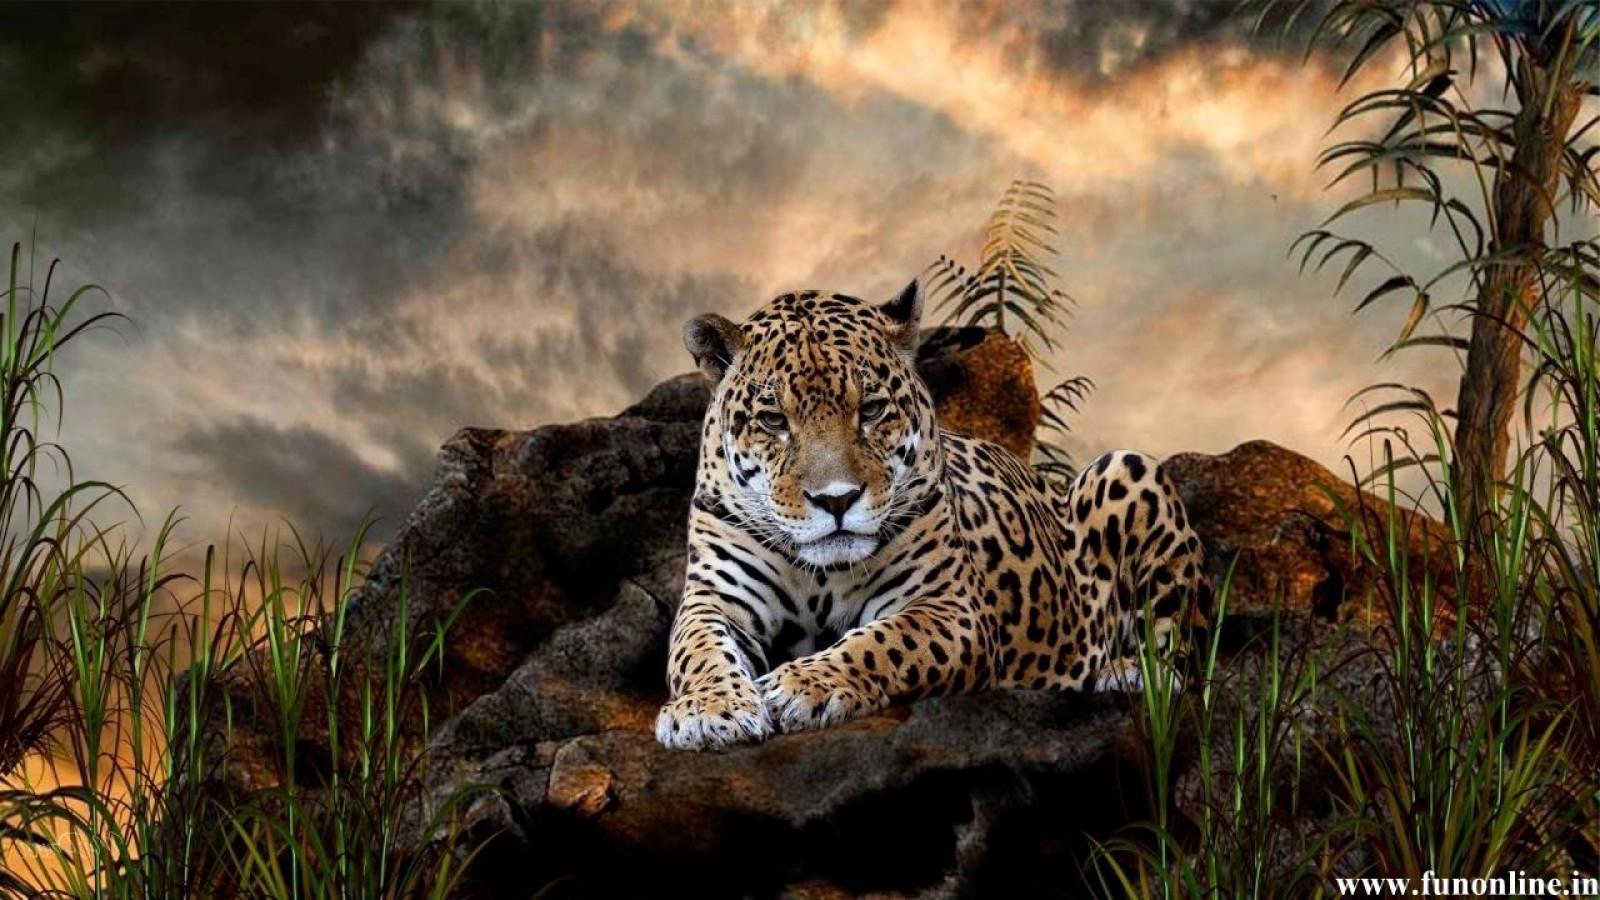 Jaguar Wallpapers Stunning Jaguar HD Wallpapers for Download 1600x900